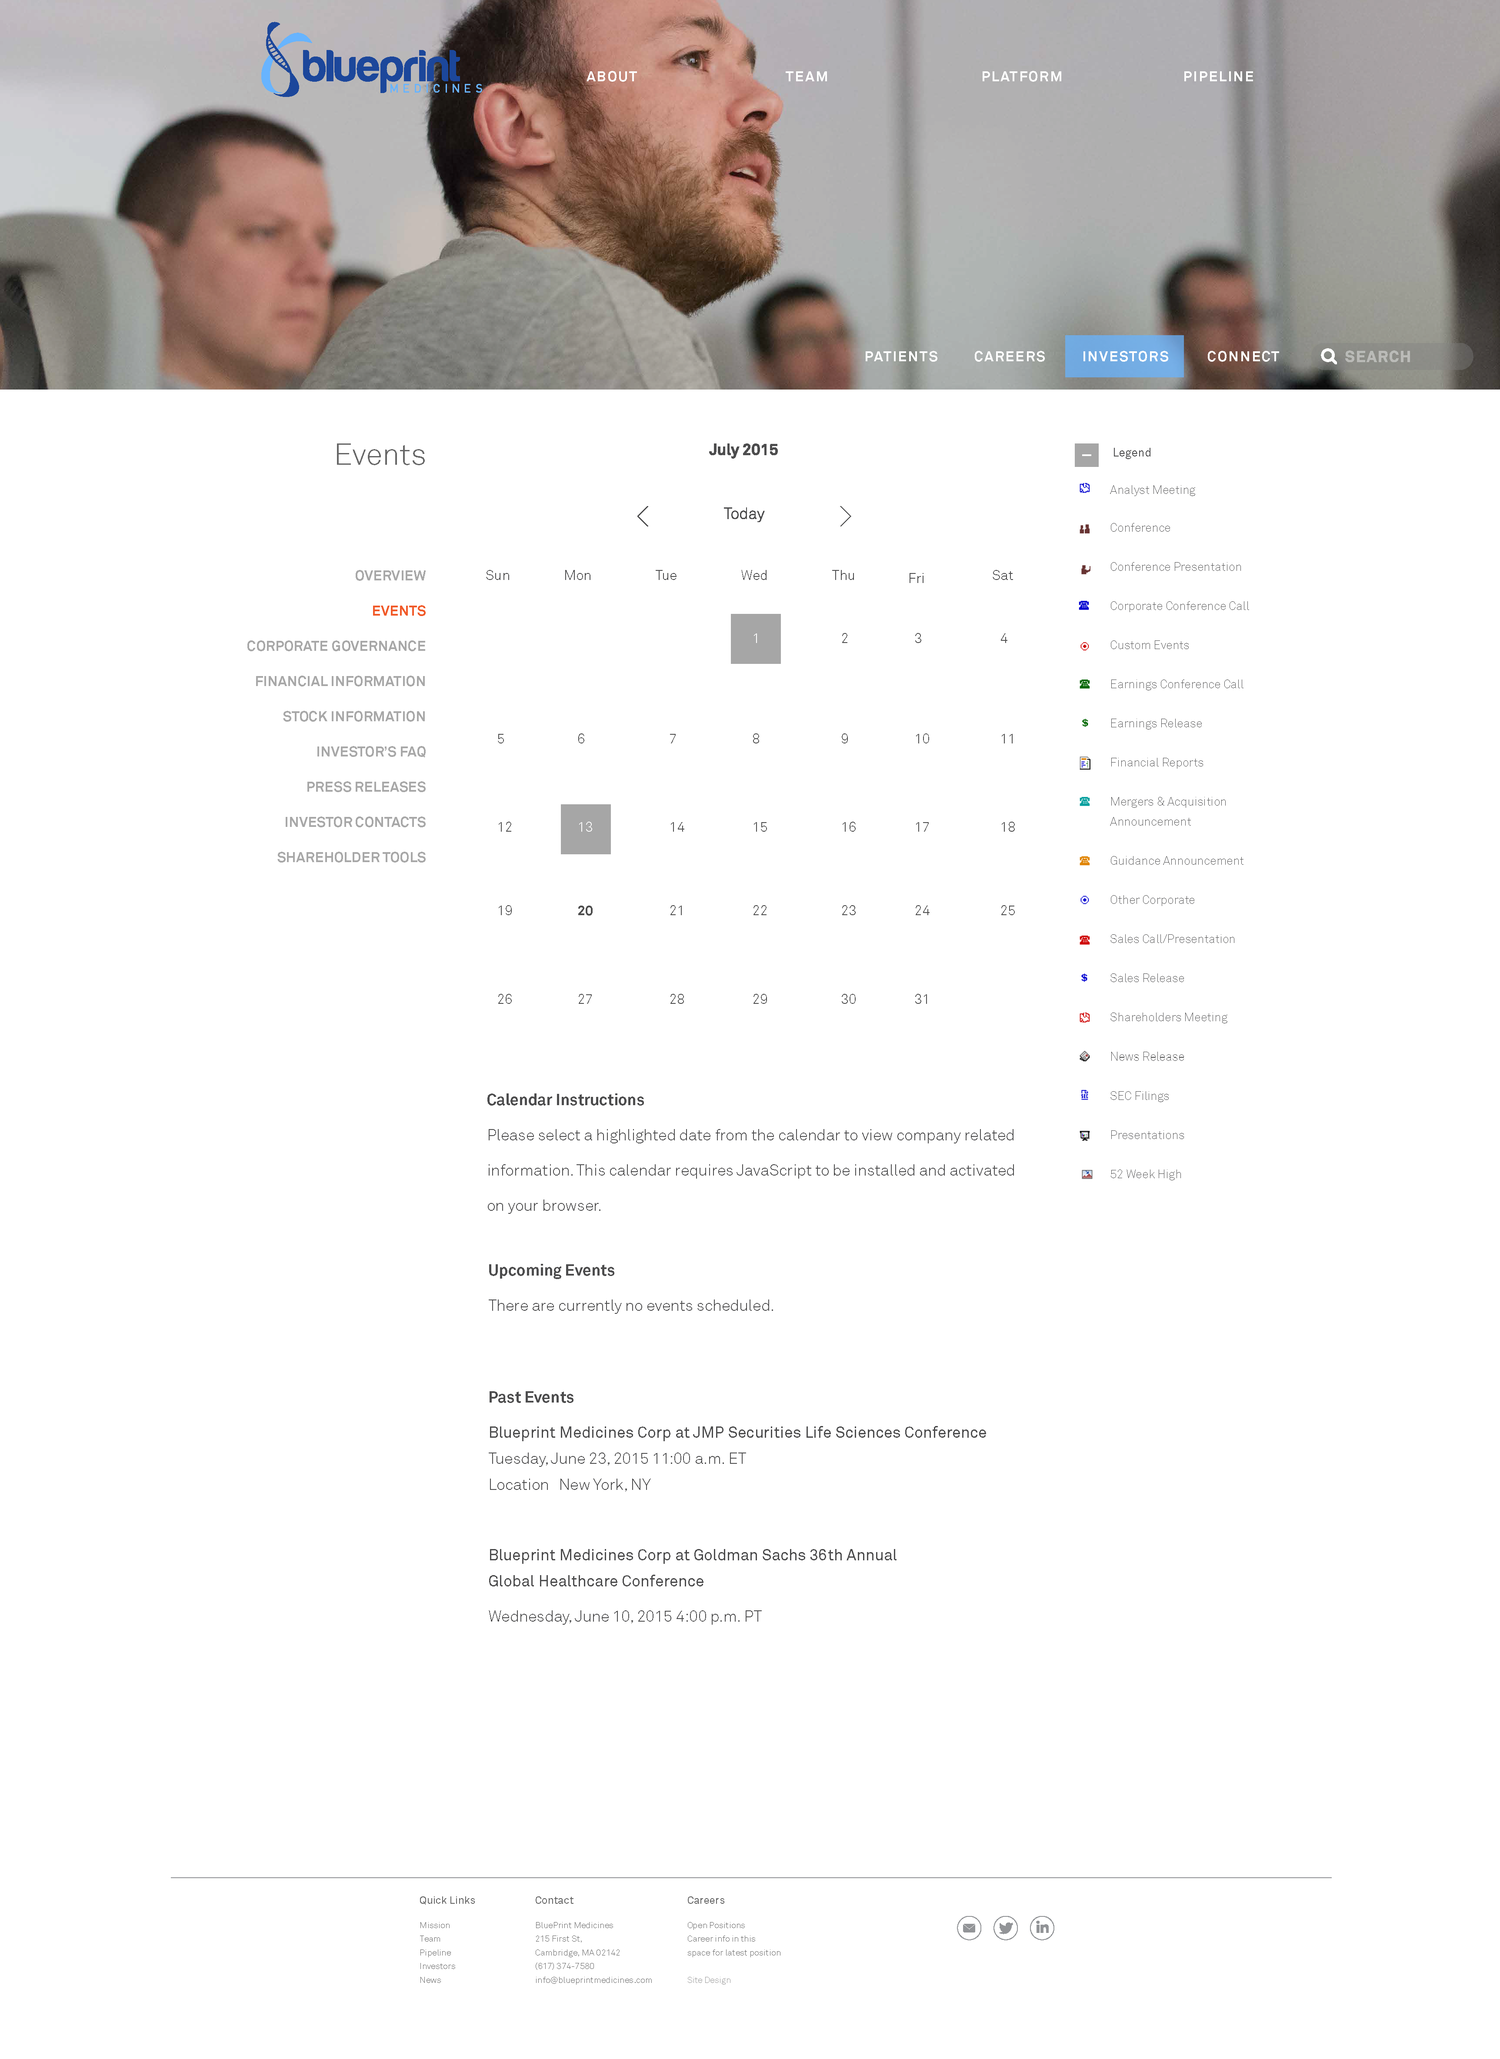 Samuel roguska 2 blueprint medicines website malvernweather Images